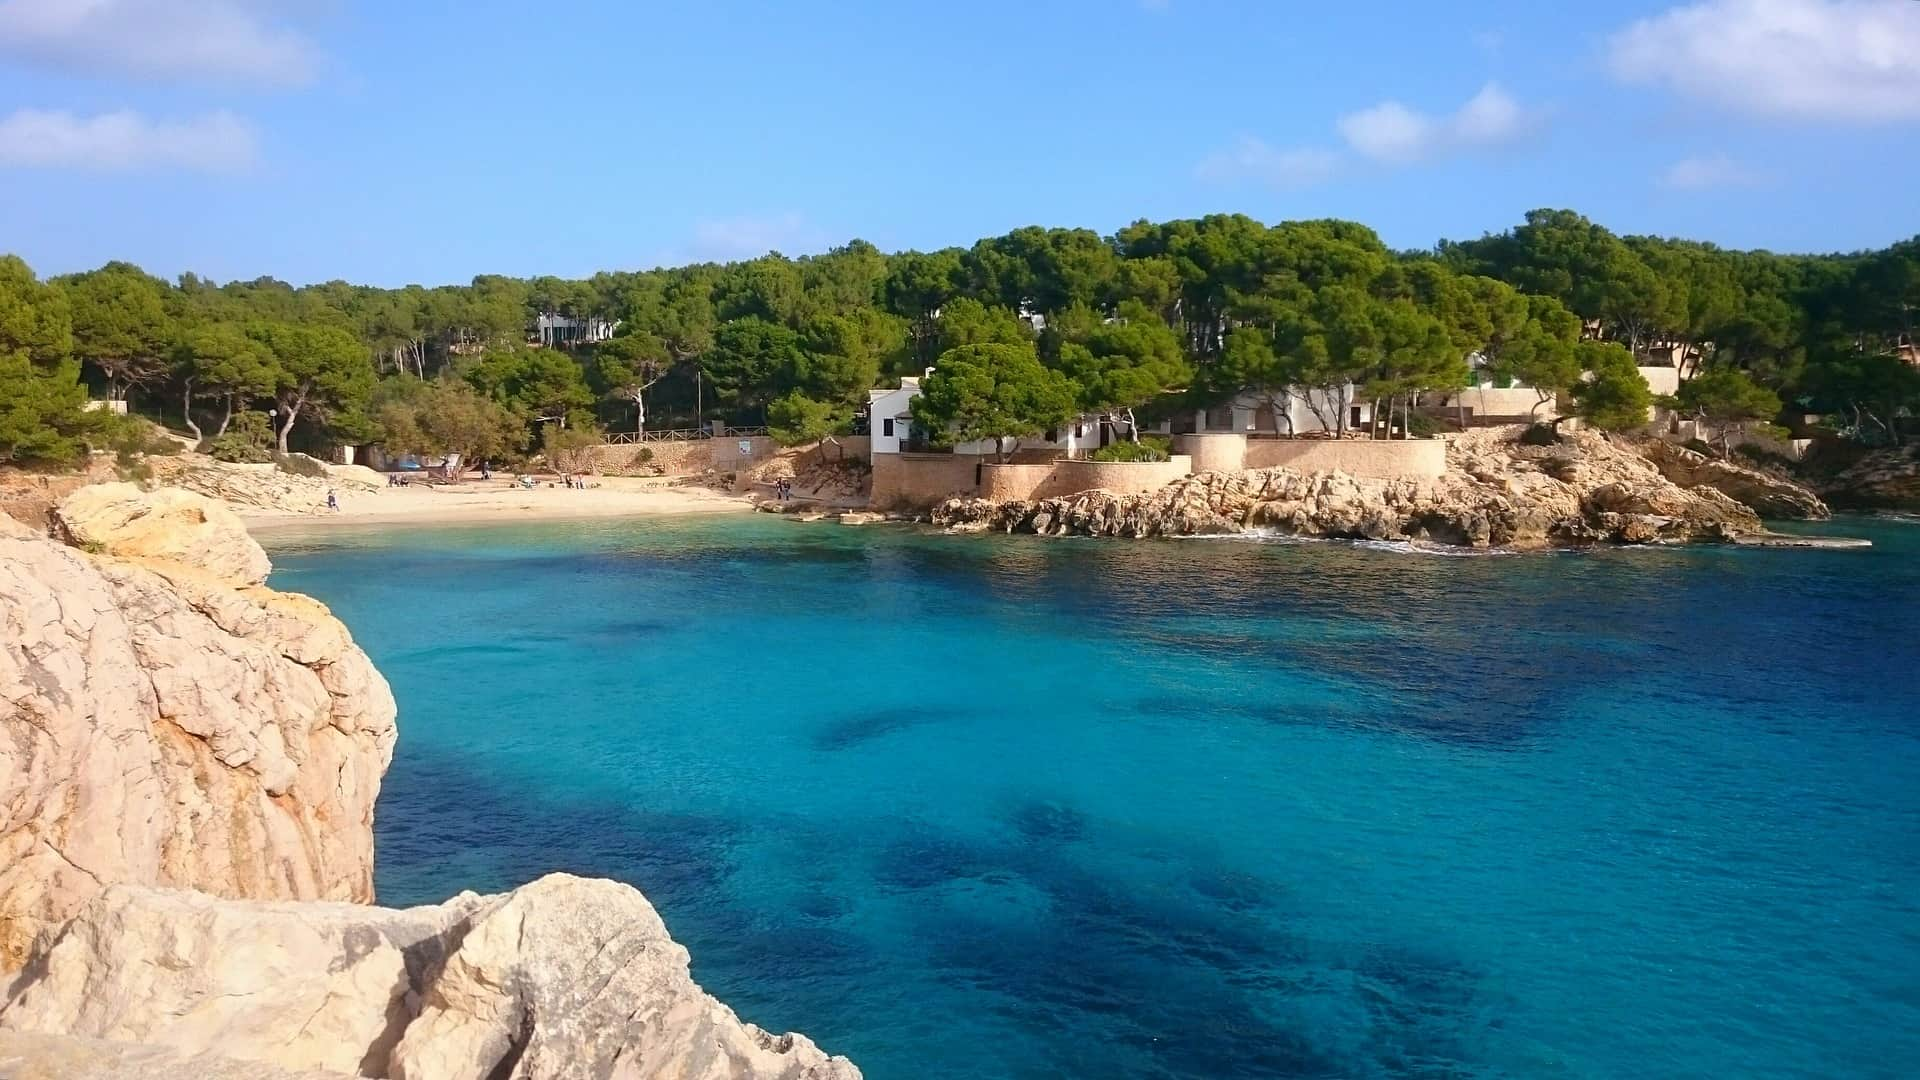 Reise Palma de Mallorca - Deals ab 121,69€ Urlaub